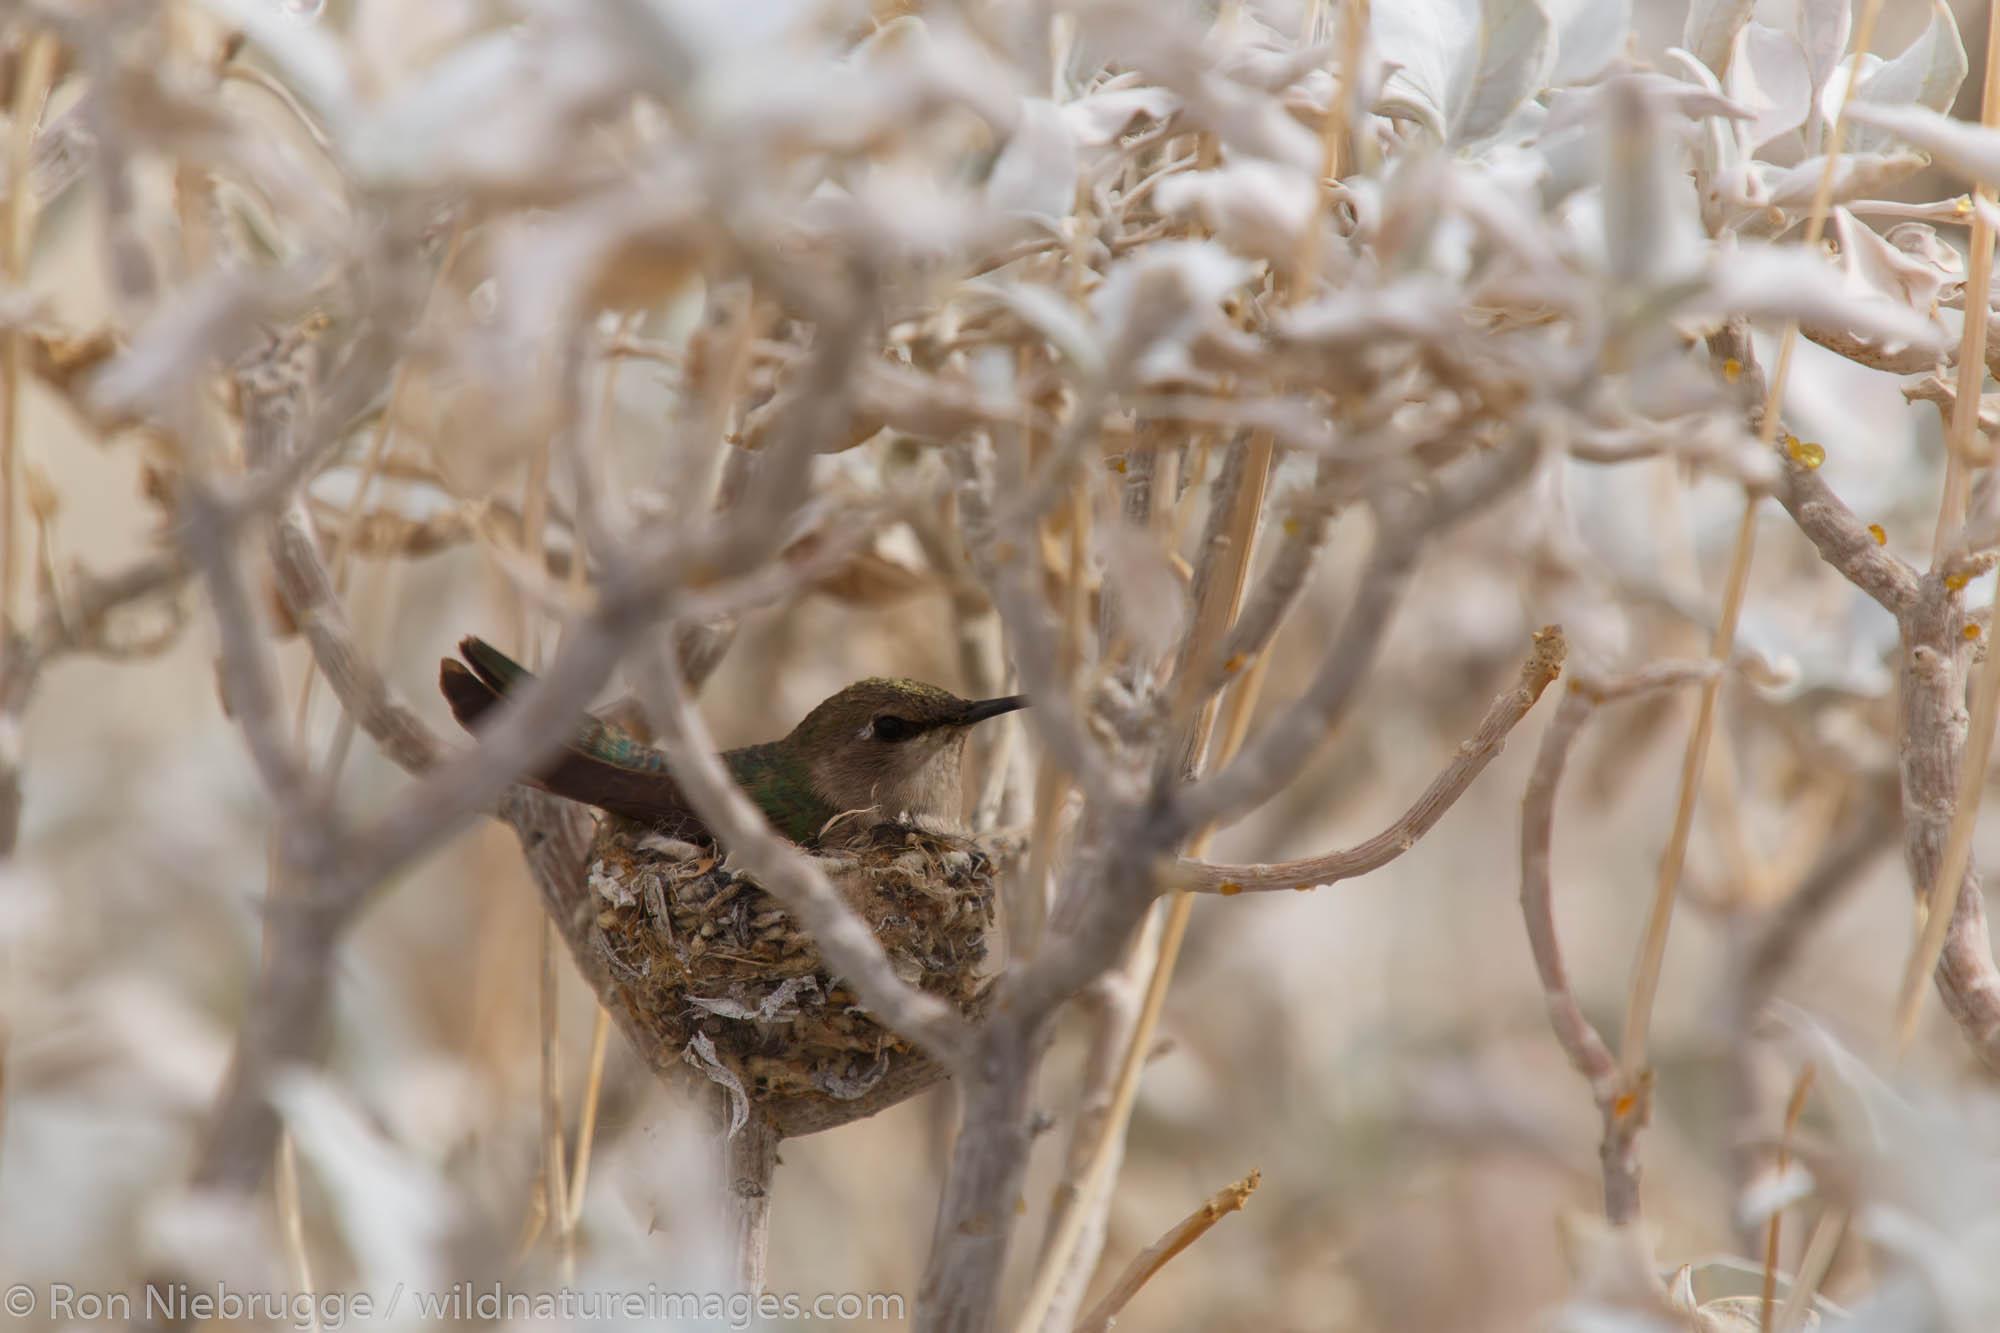 Hummingbird nest, Anza-Borrego Desert State Park, California.